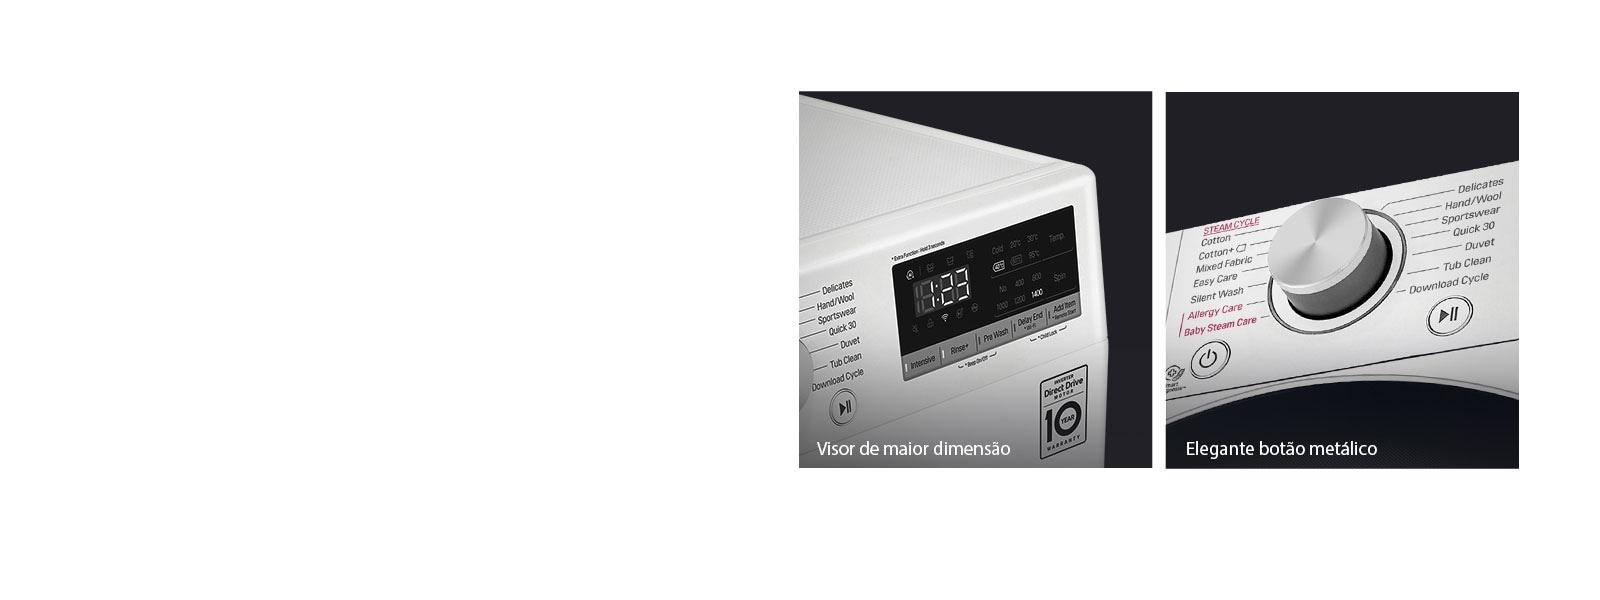 WM-Vivace-V500-VC4-White-07-Design-Desktop